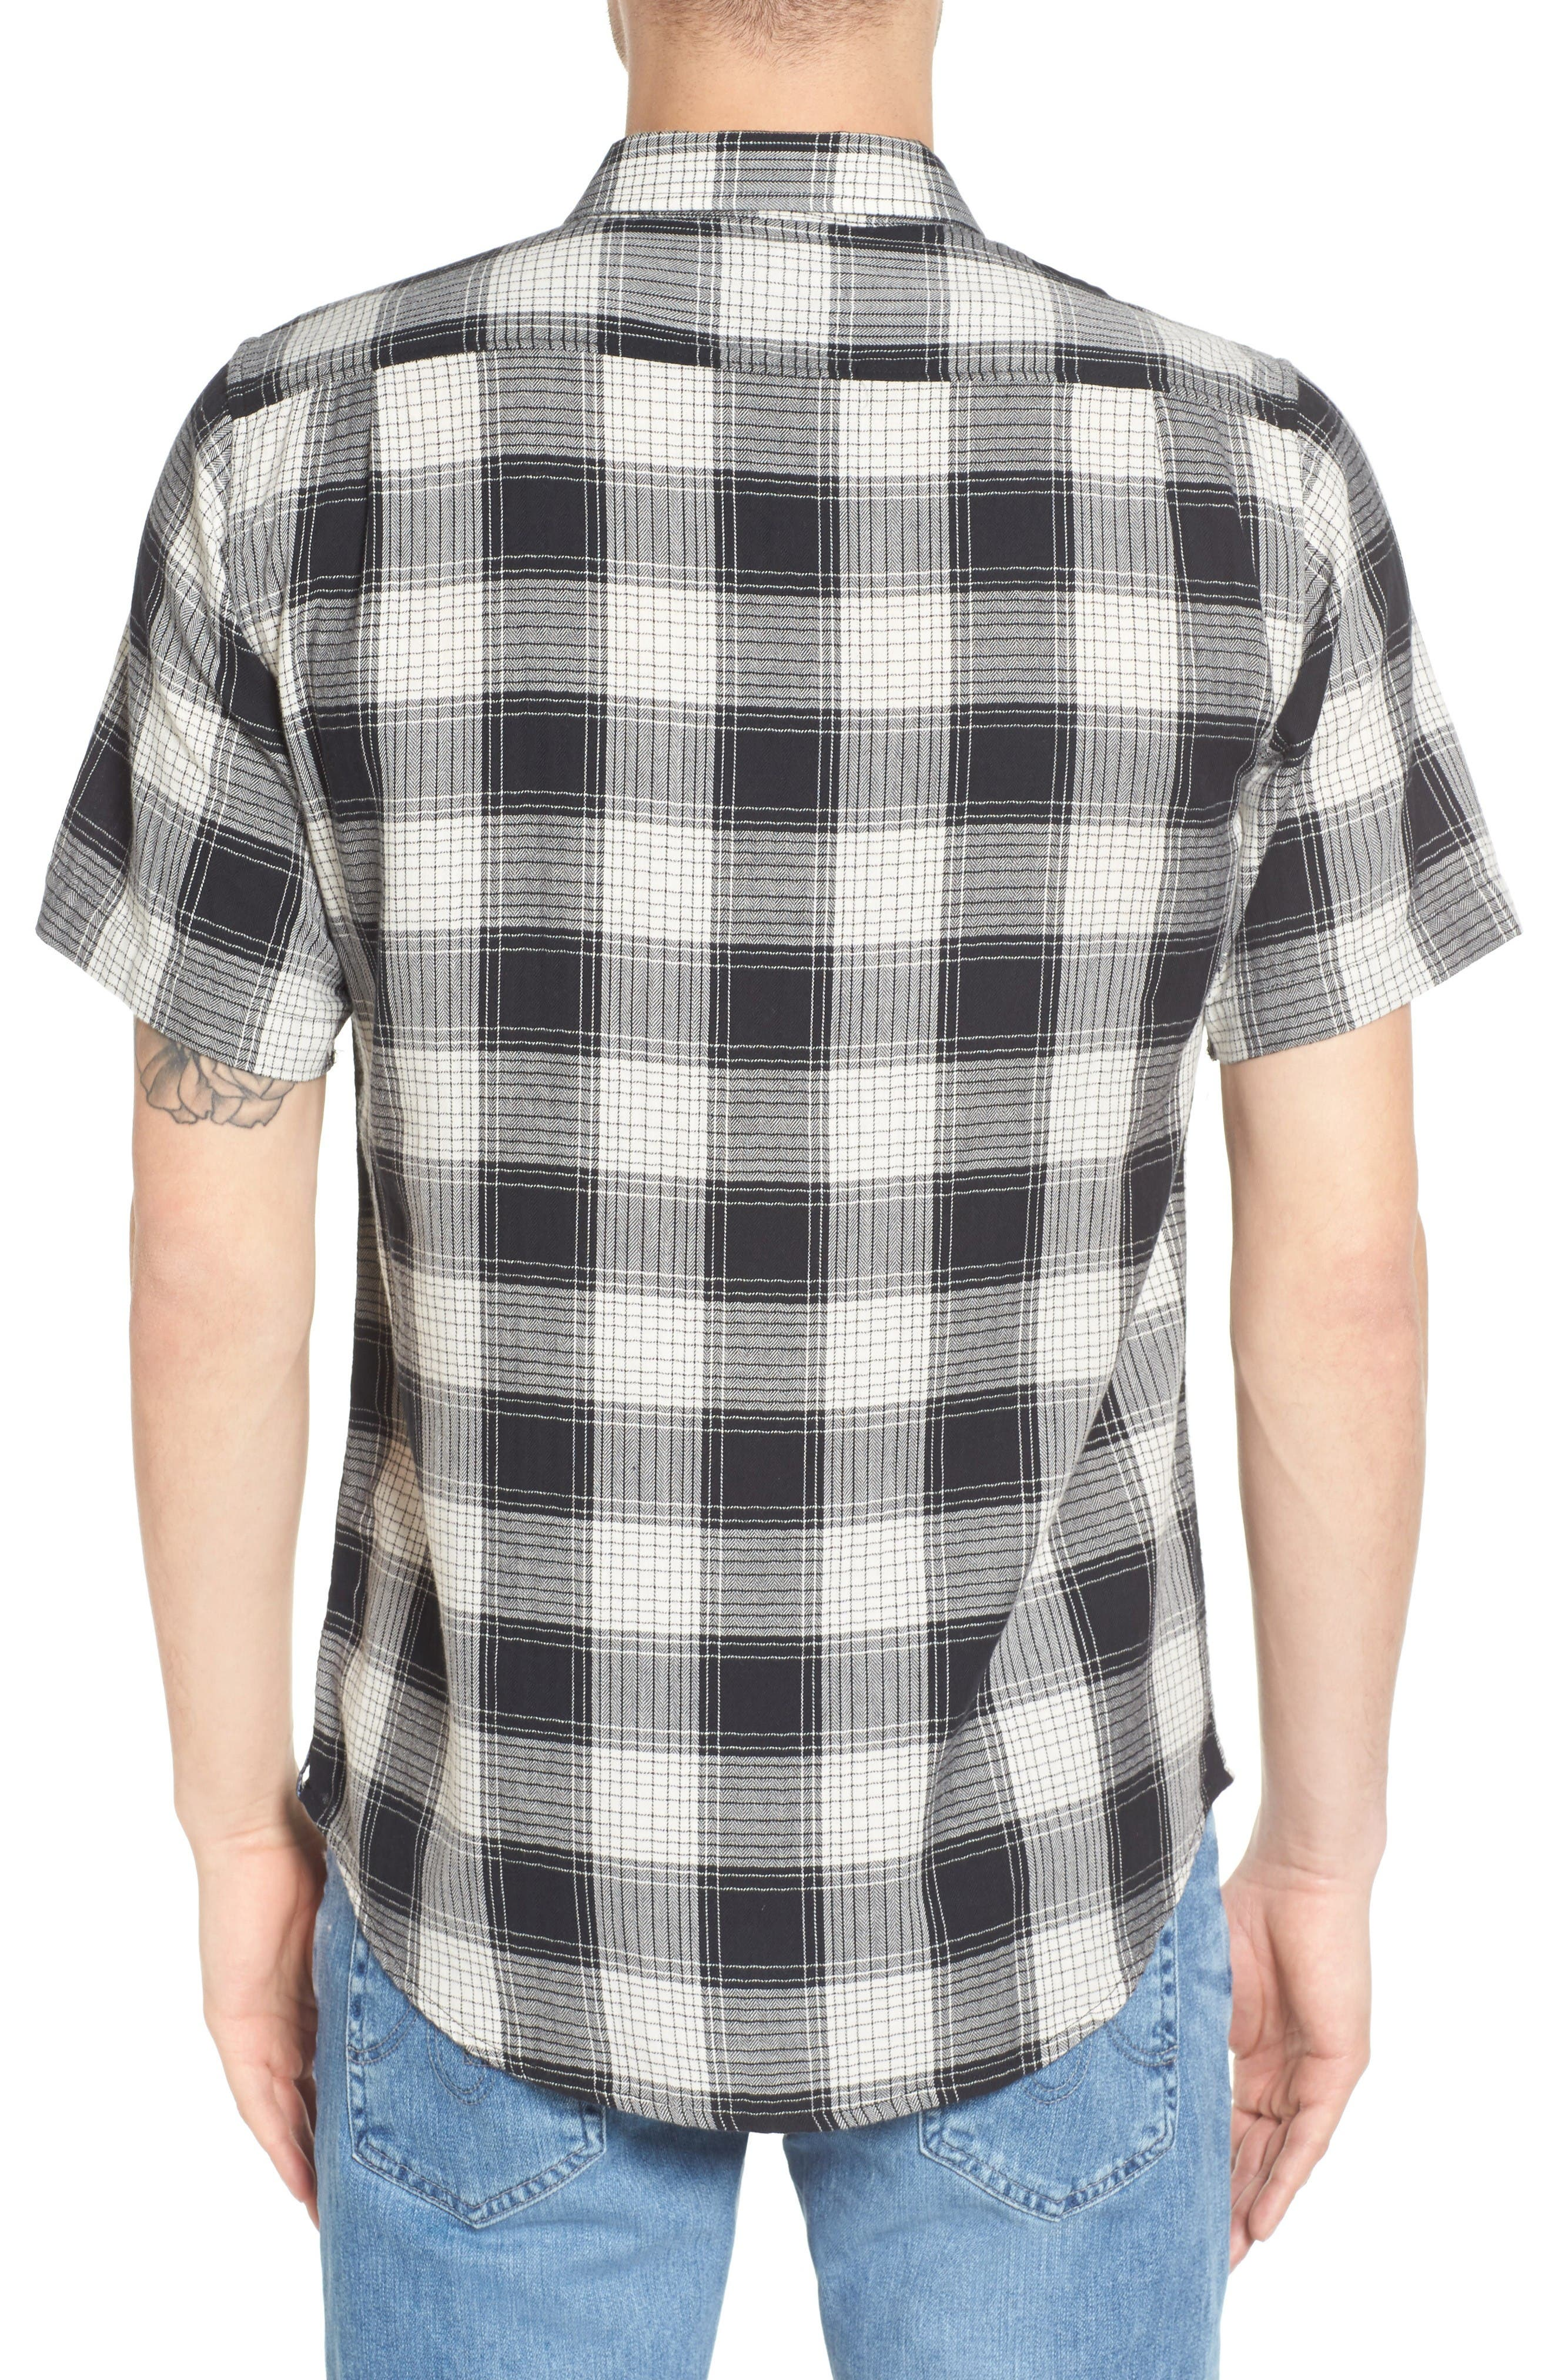 Alternate Image 2  - Ezekiel Herringbone Woven Plaid Shirt